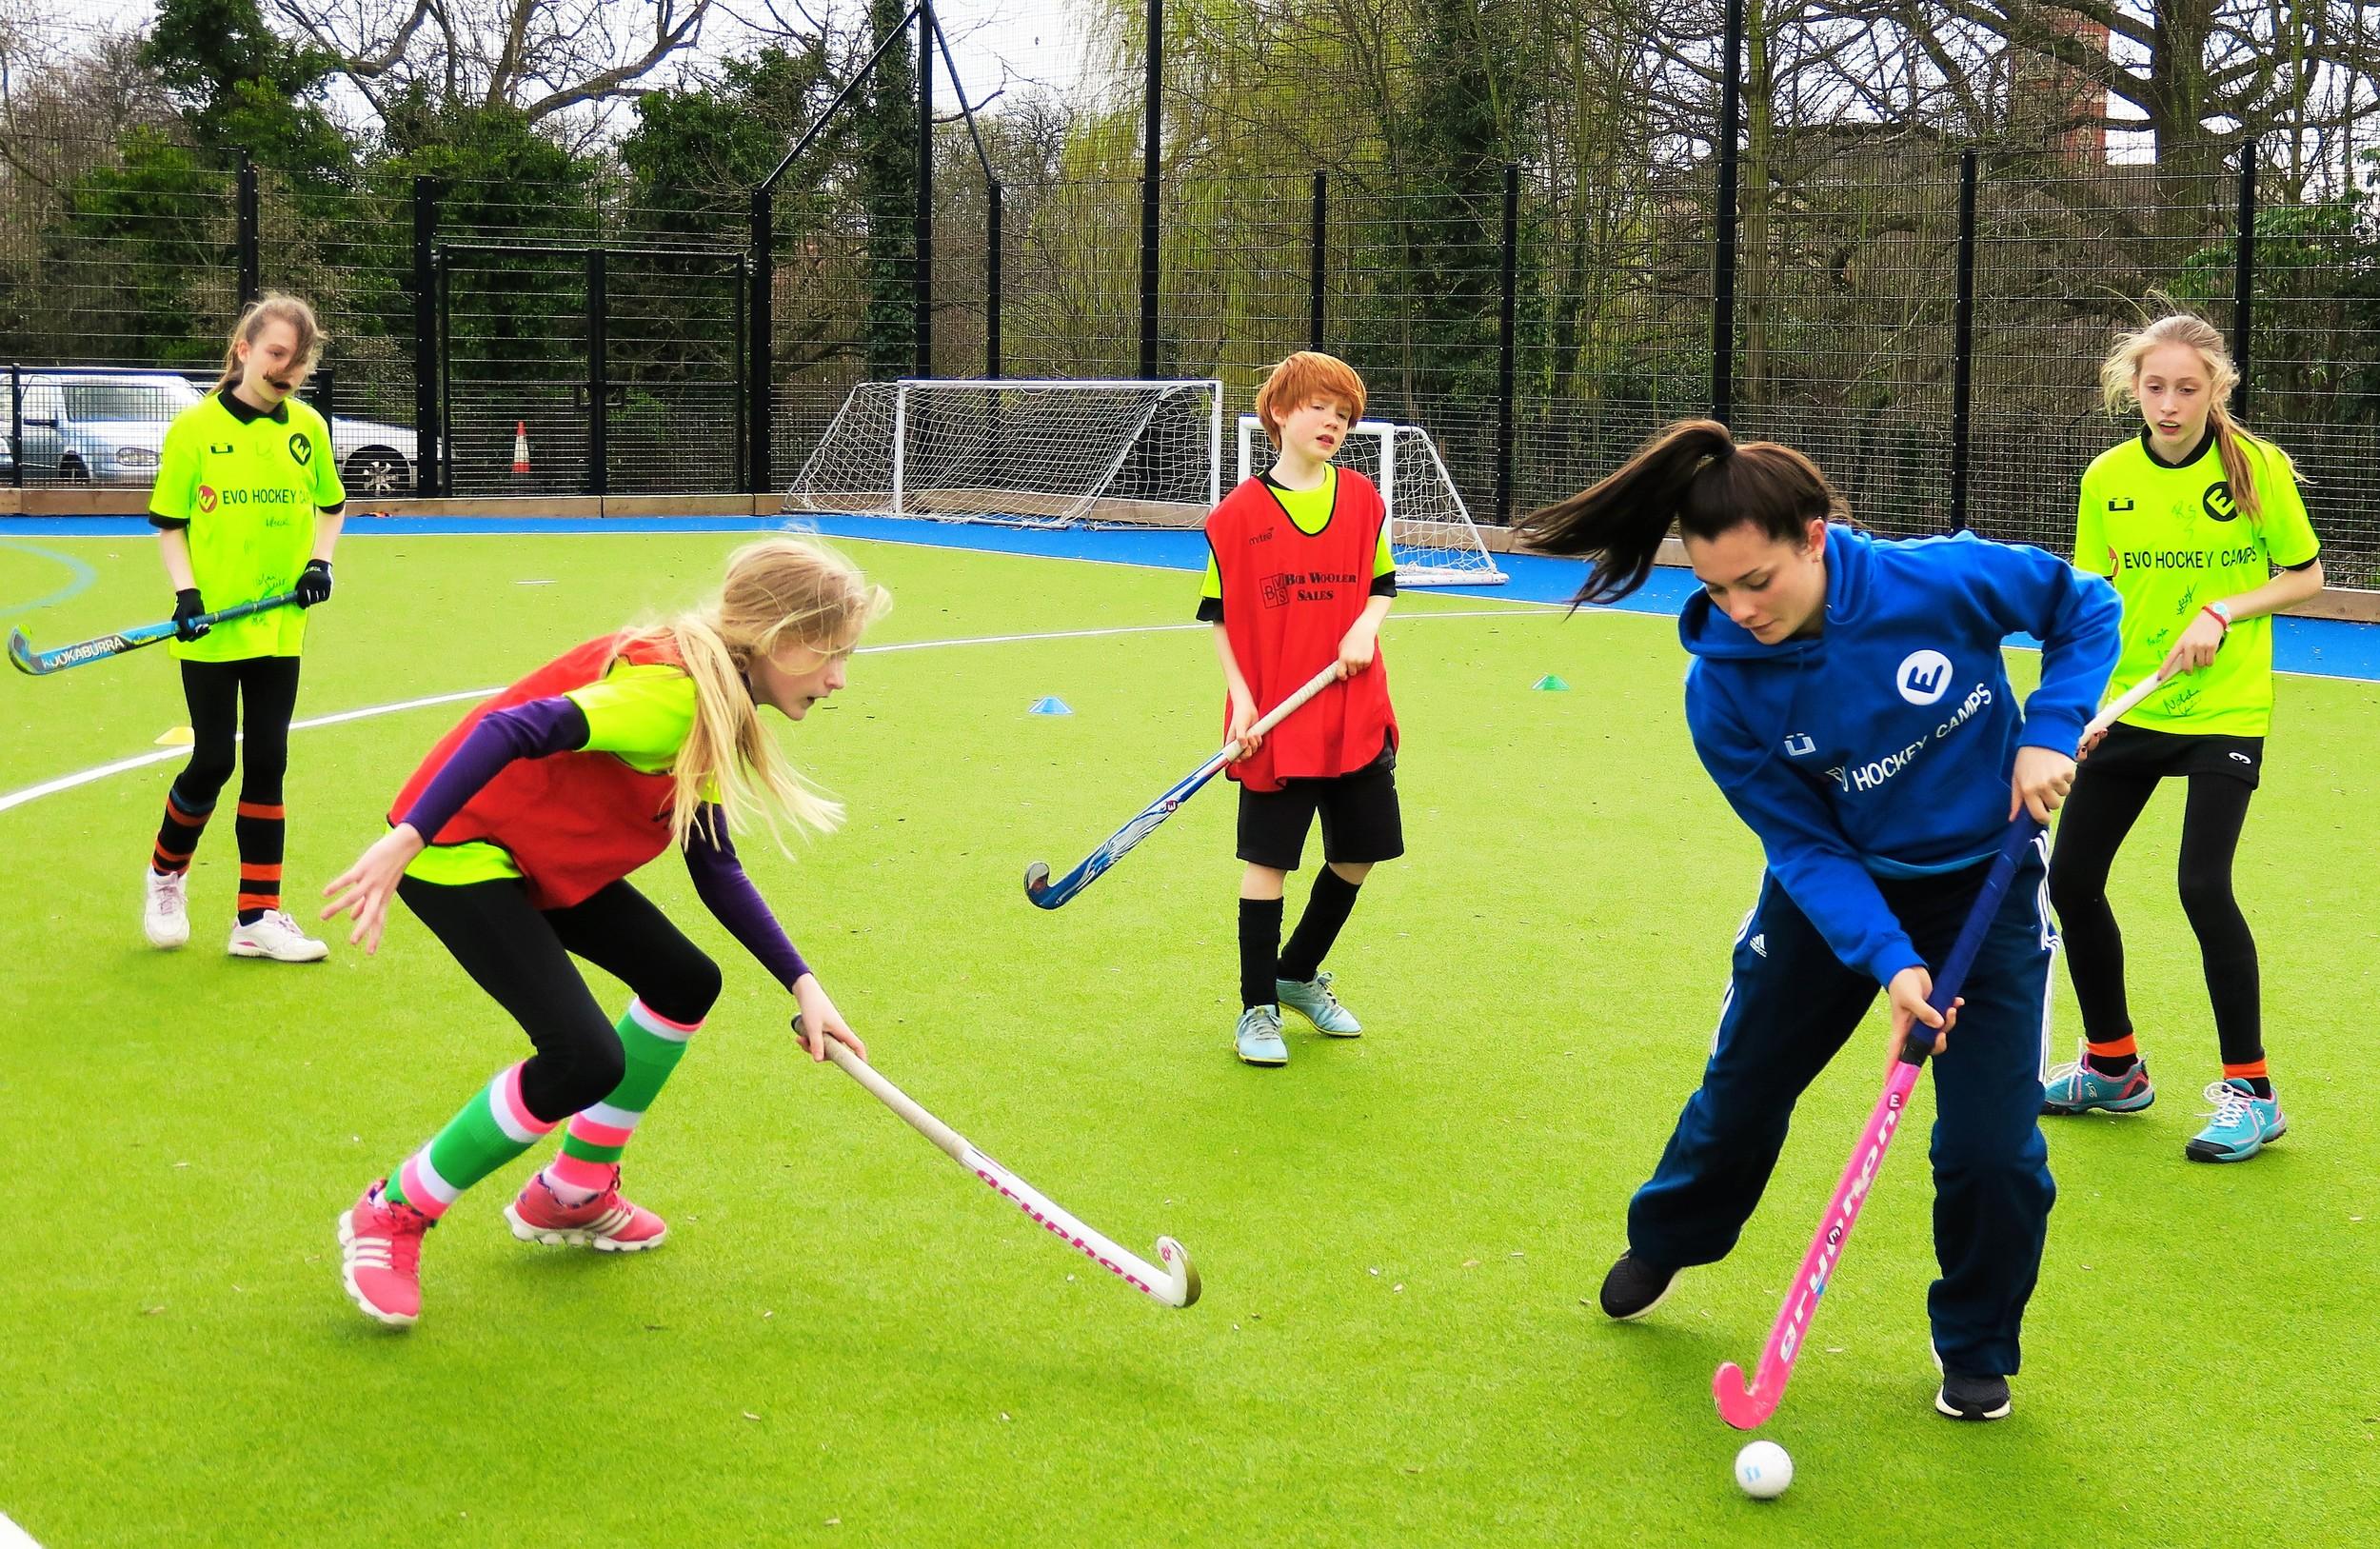 Harriet coaching with EVO Hockey